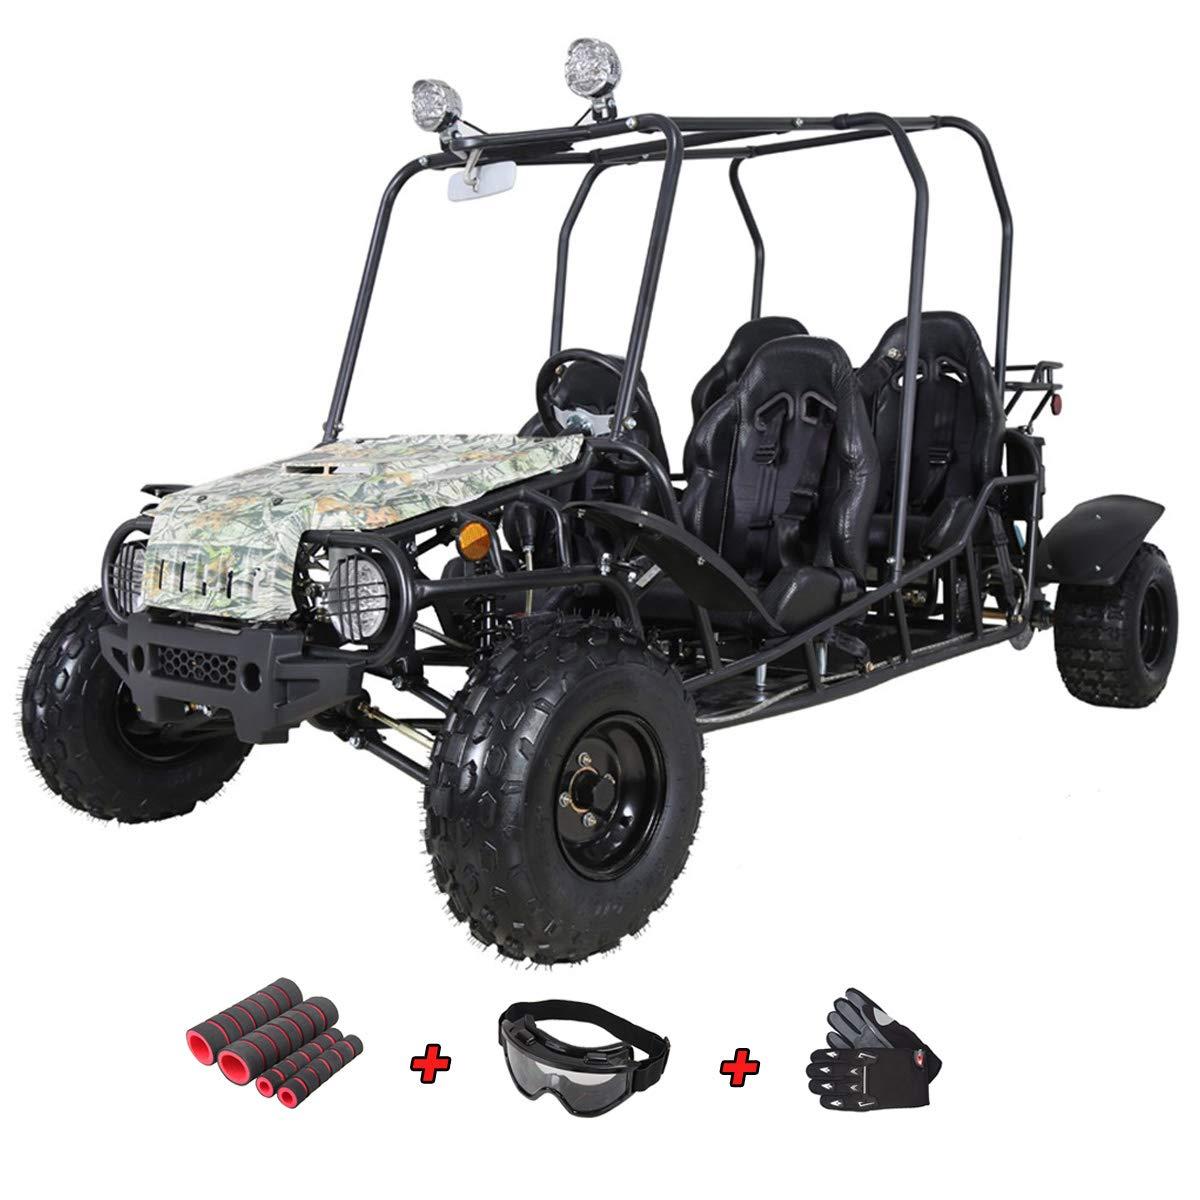 X-Pro 200cc Adult Gokart Dune Buggy Adults Go Cart Gokart 4 Seater Go Kart with Gloves, Google and Handgrip (Tree Camo)